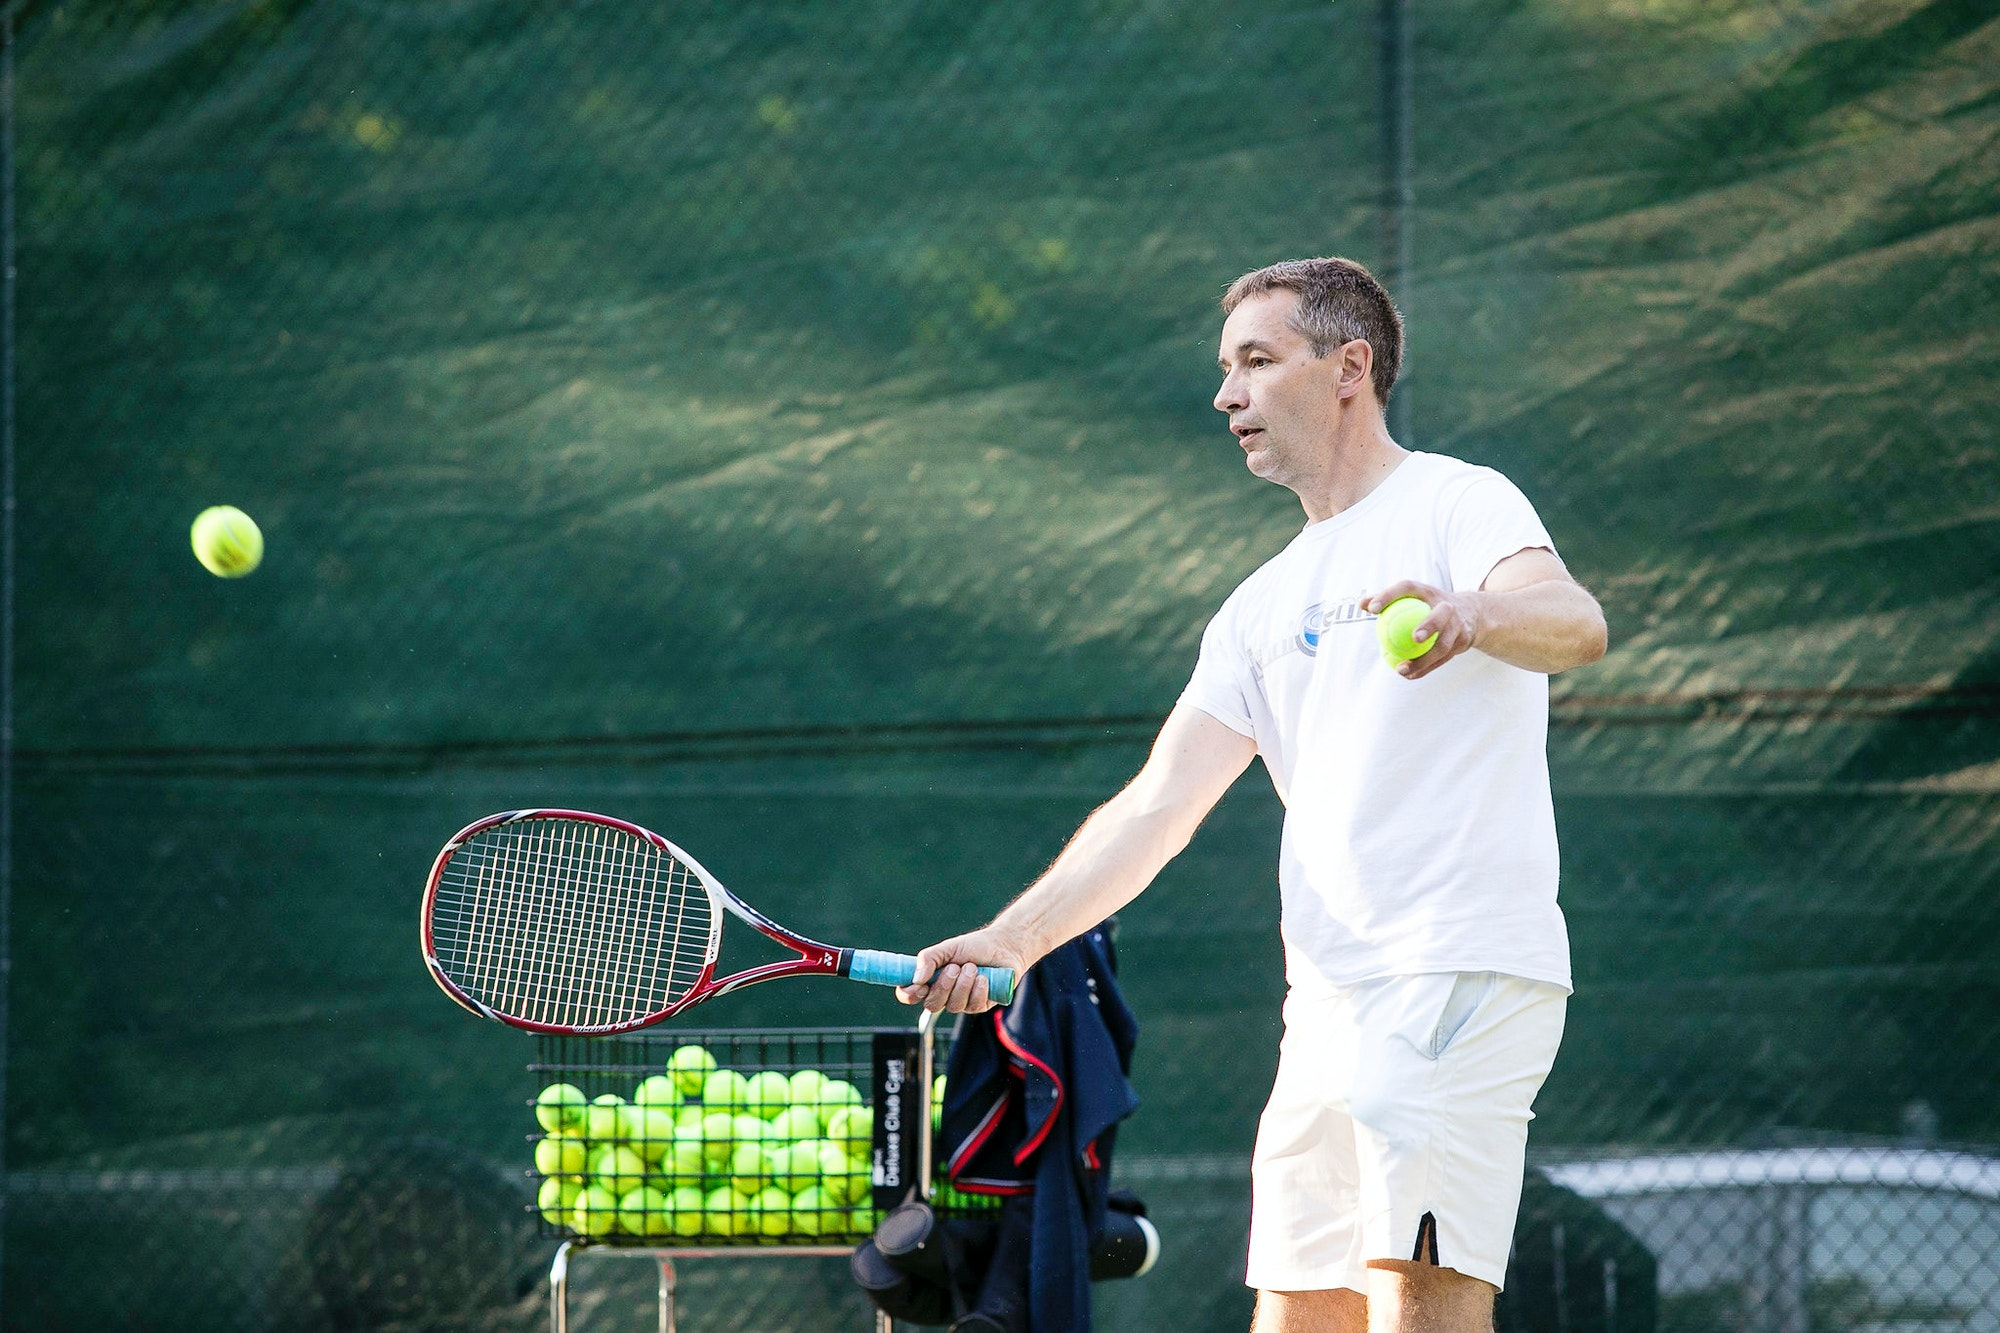 Holger S. teaches tennis lessons in Richmond, VA